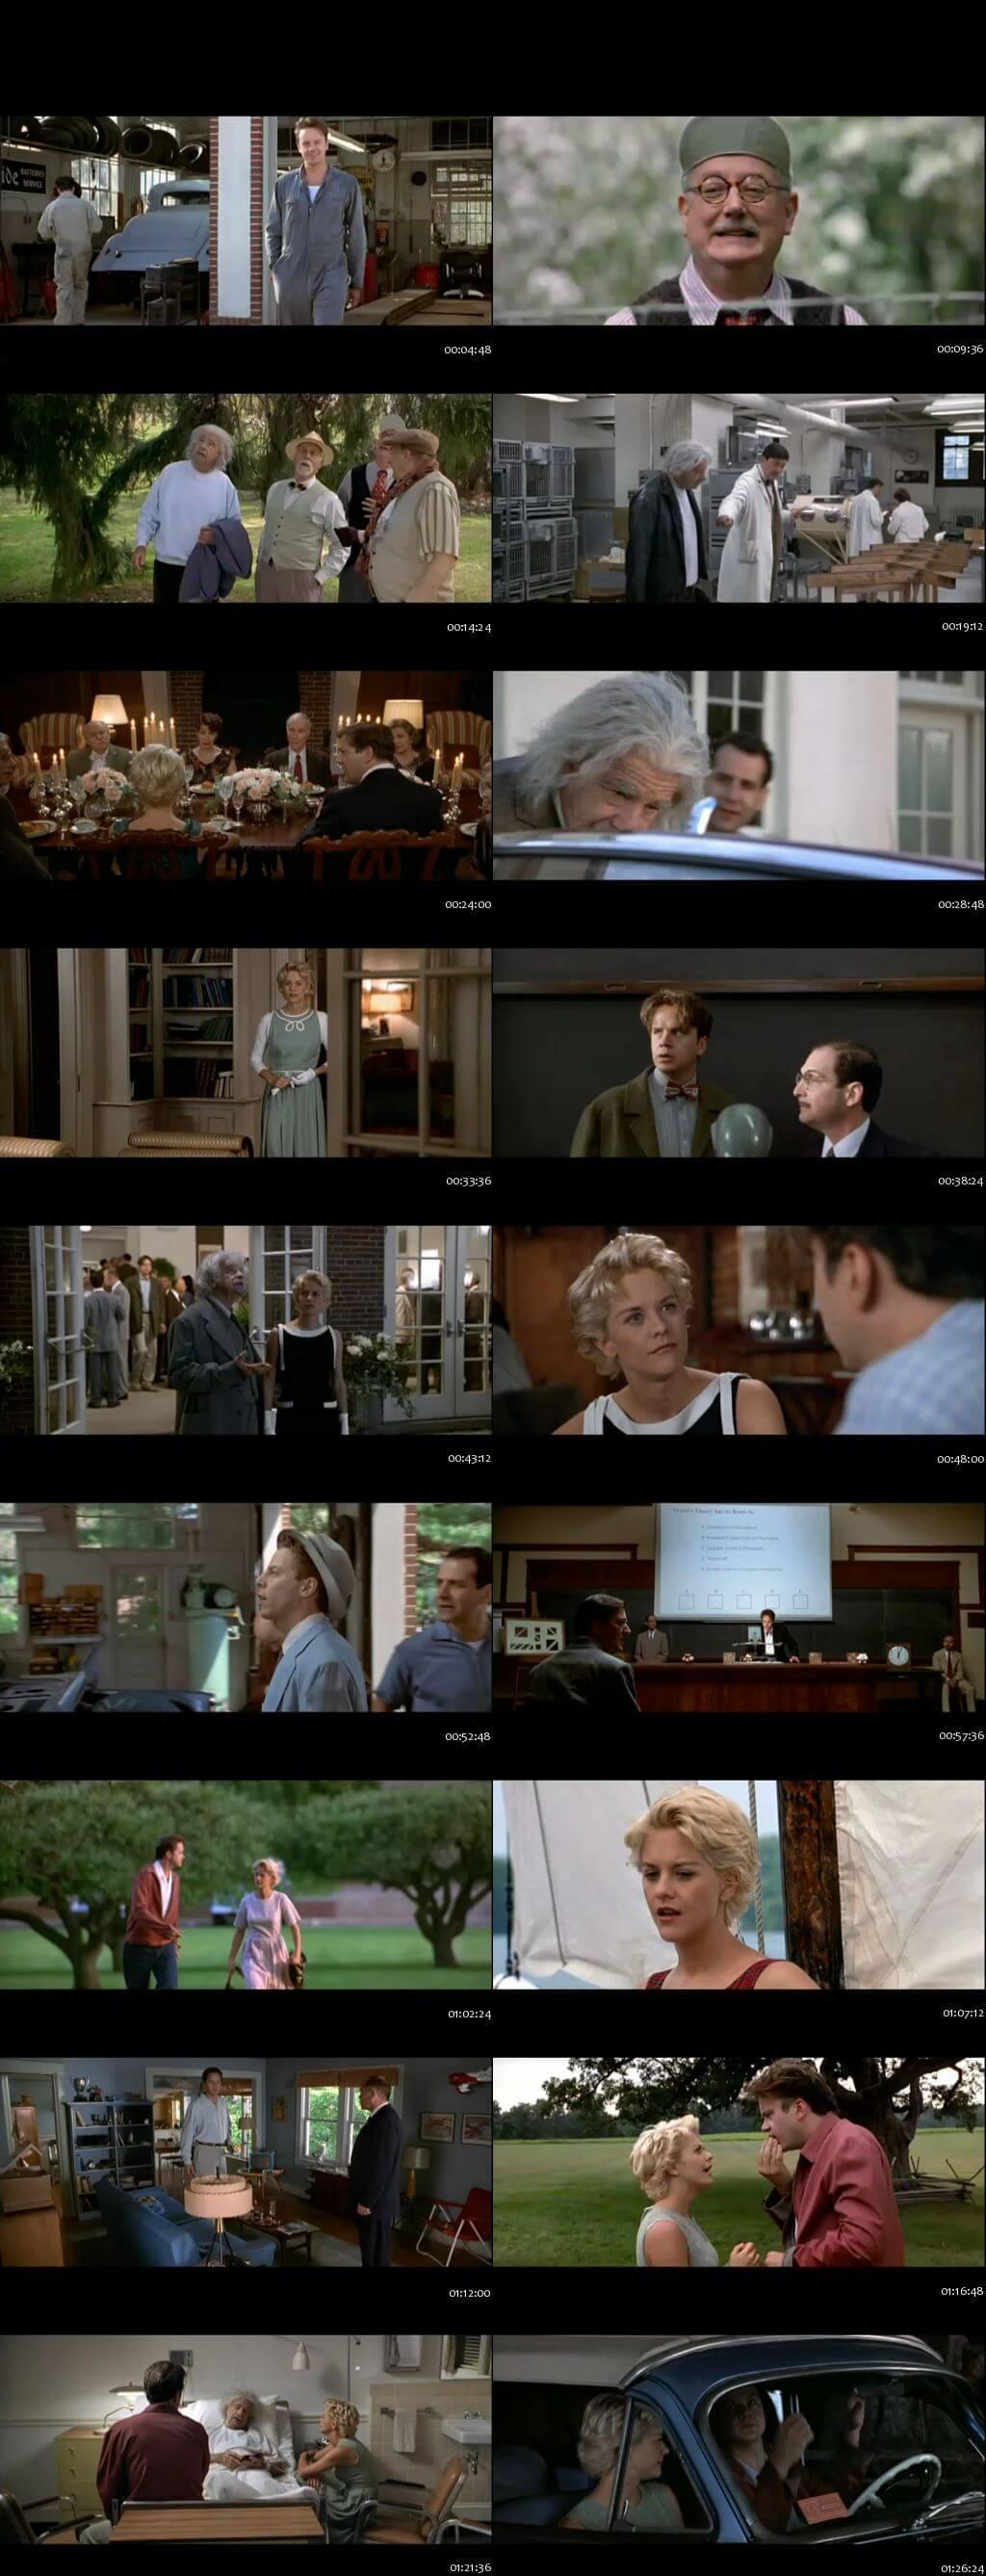 Screenshot Of Watch Online I.Q. (1994) Full Movie Download Free DVDRip HQ